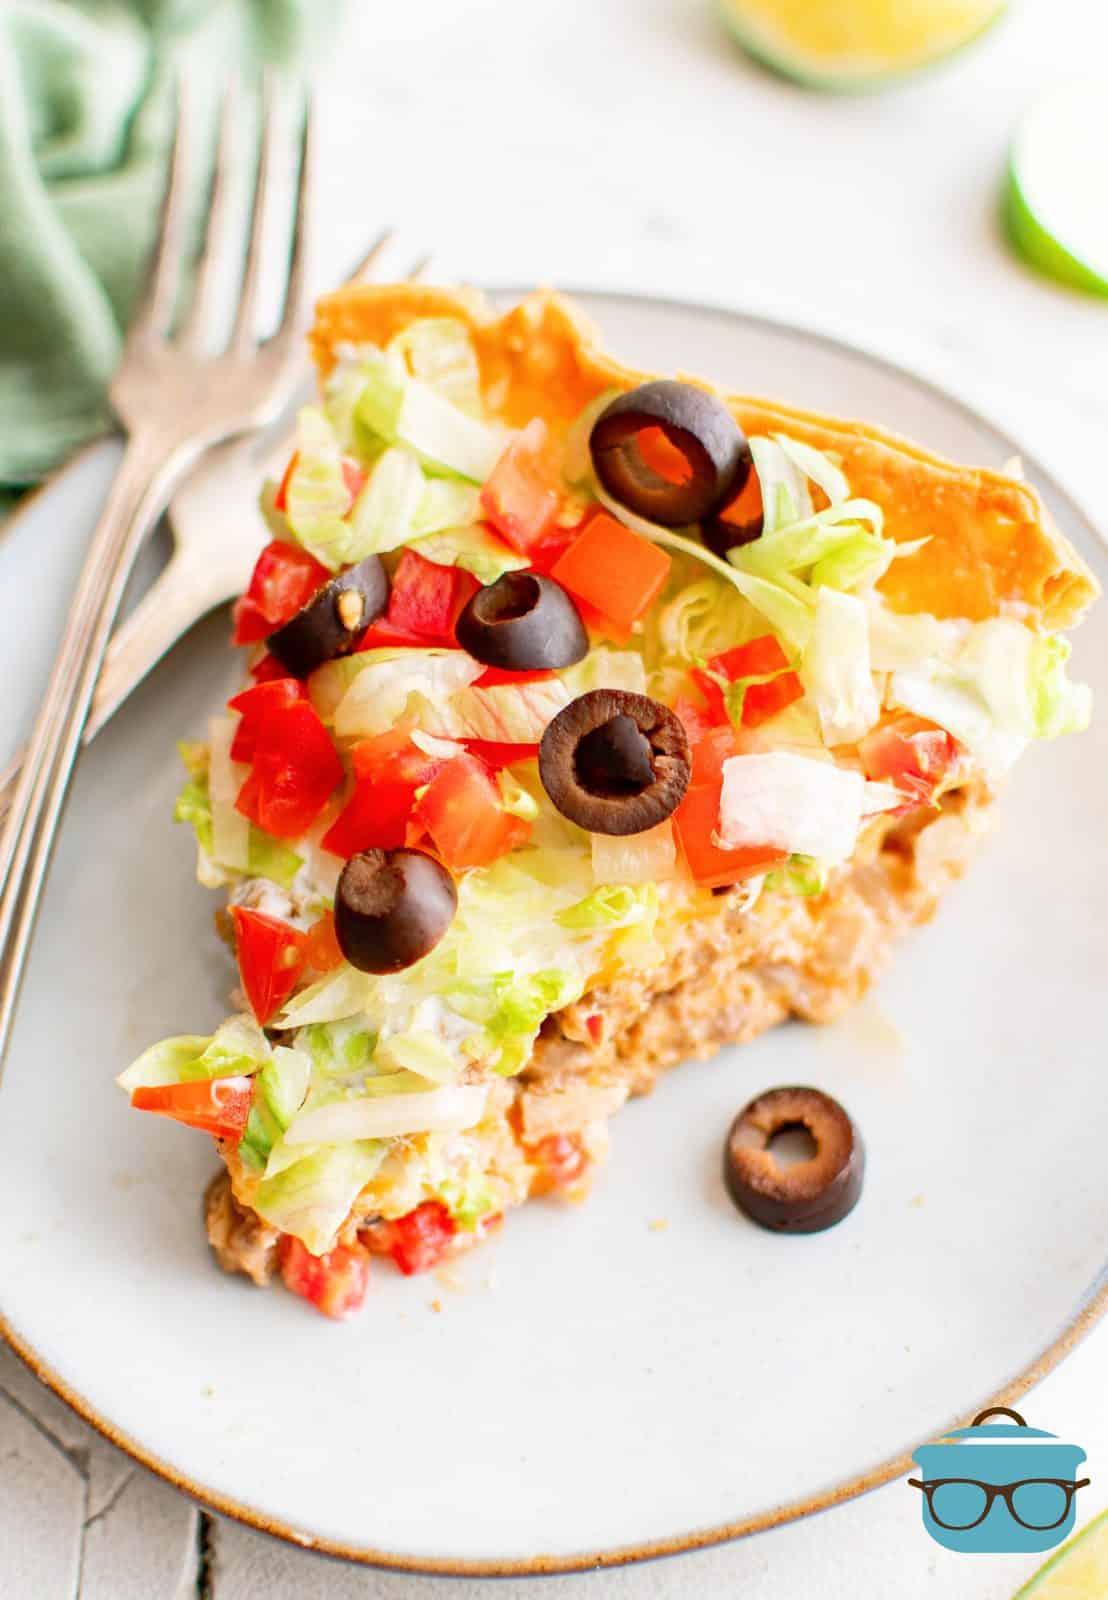 Slice of Homemade Taco Pie on white plate.